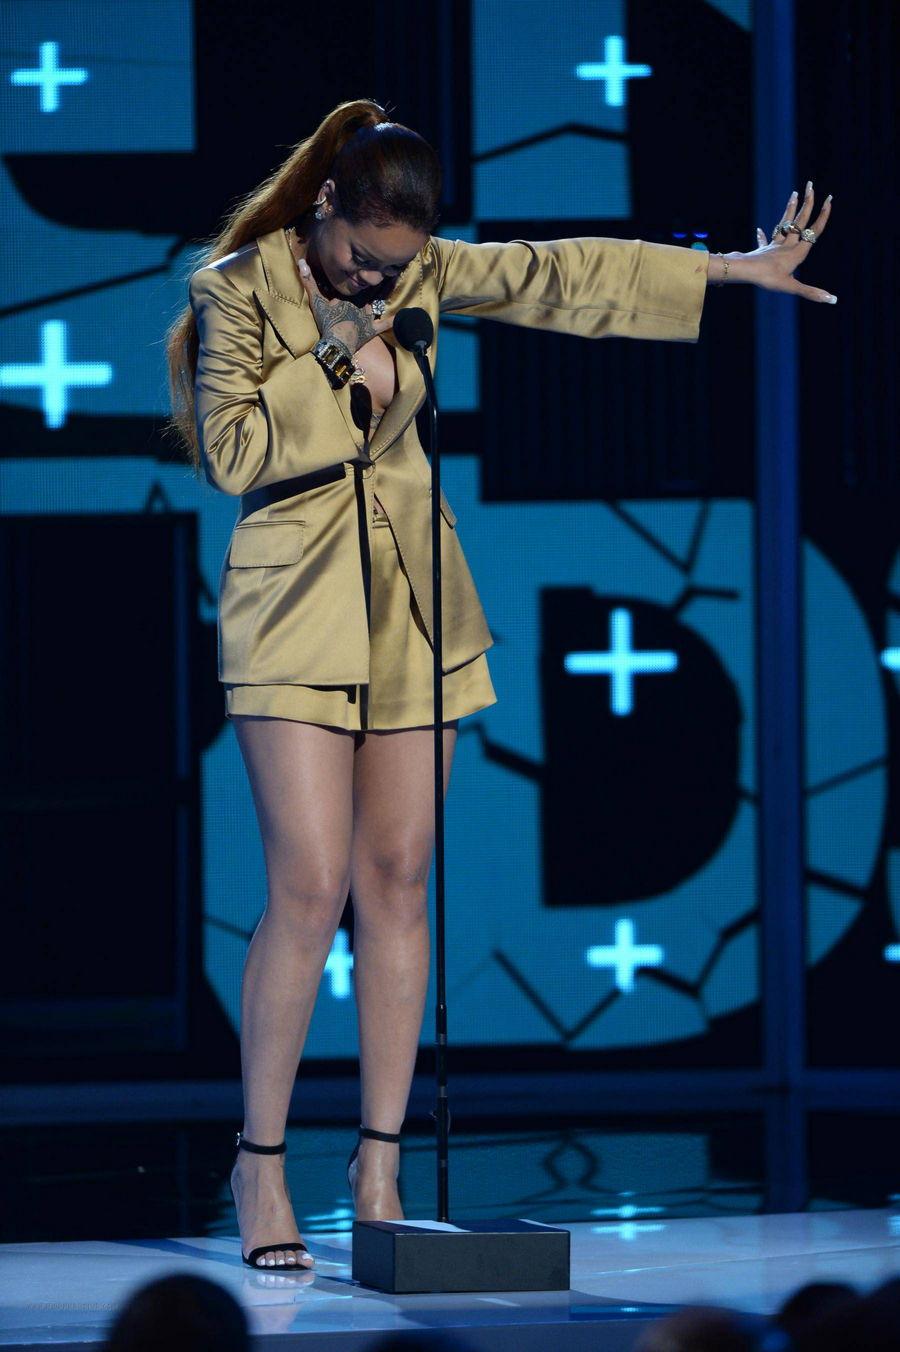 Rihanna's Legs Pics